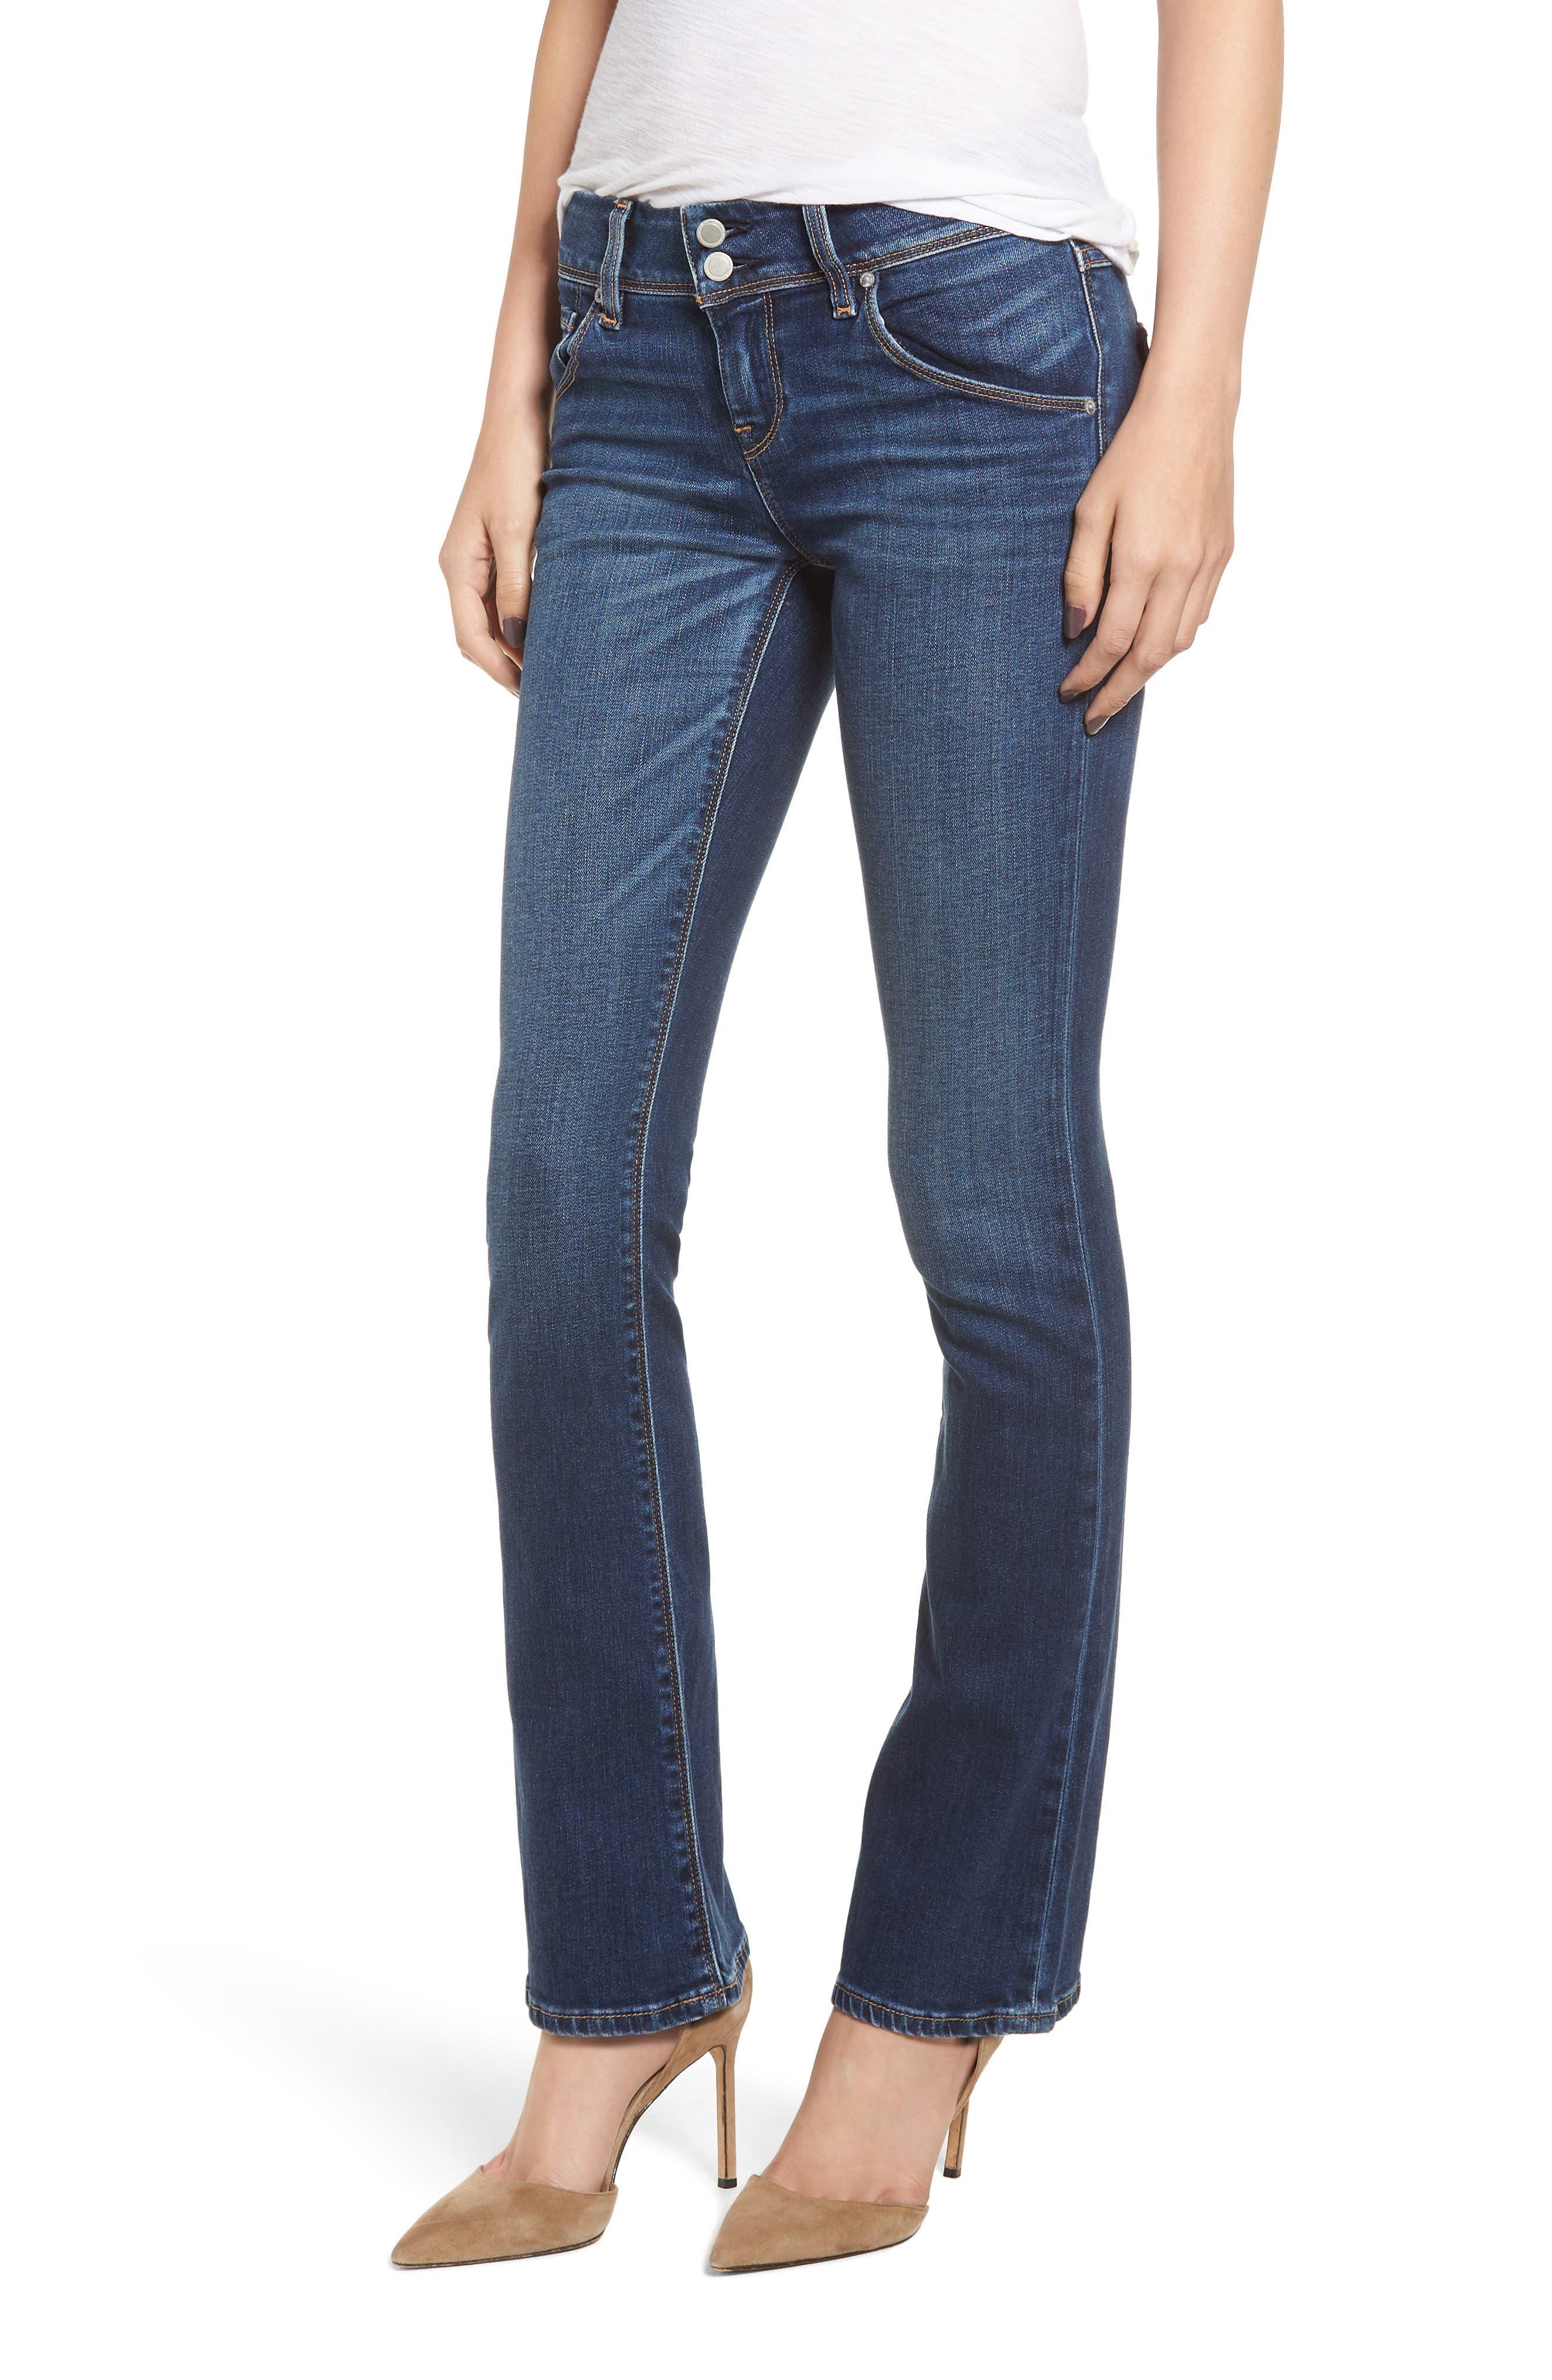 Petite Women's Hudson Jeans Beth Baby Bootcut Jeans